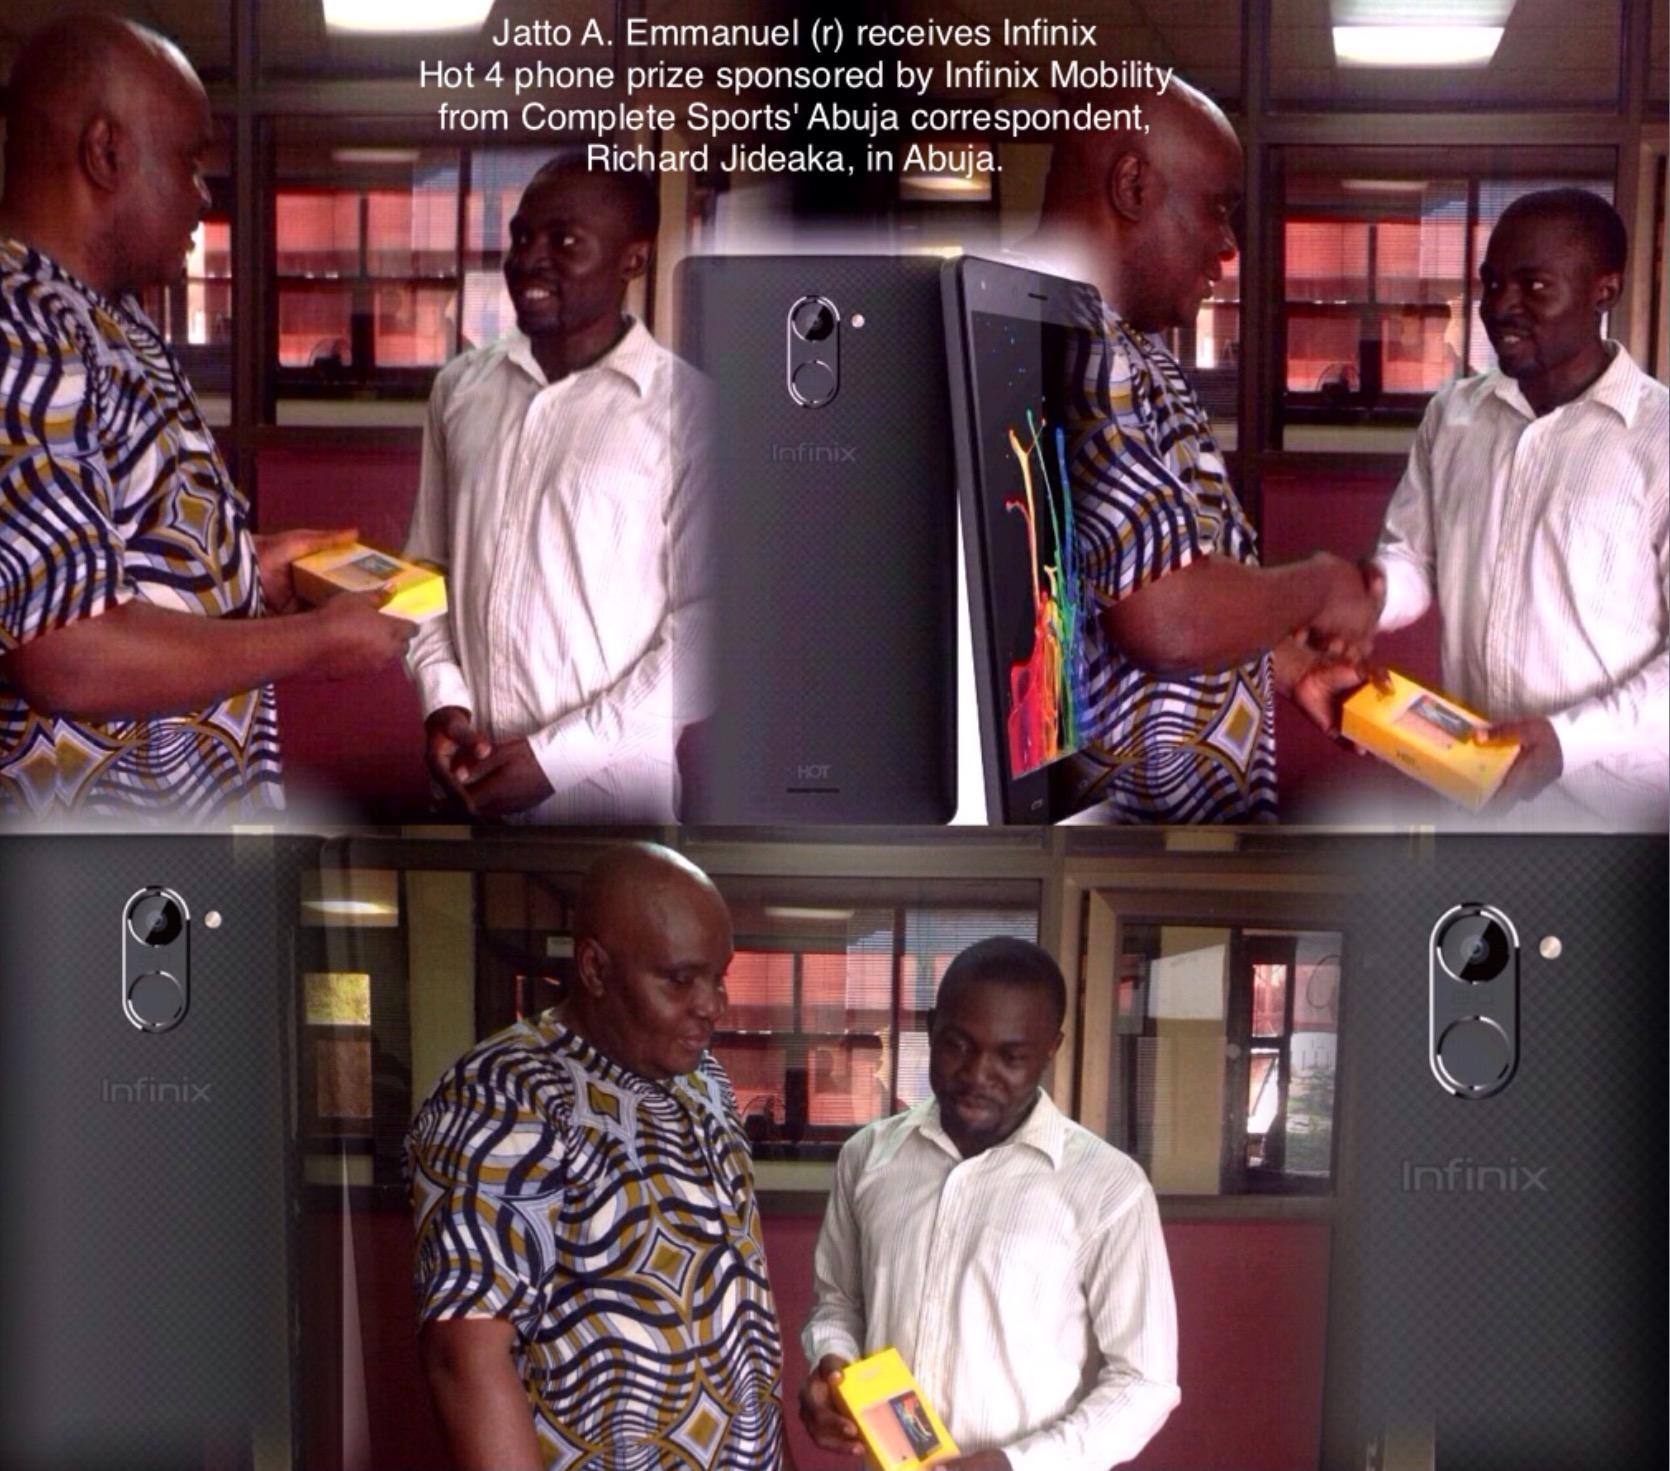 Infinix Hot Match: Abuja-Based Winner Receives Infinix Hot 4 Prize!